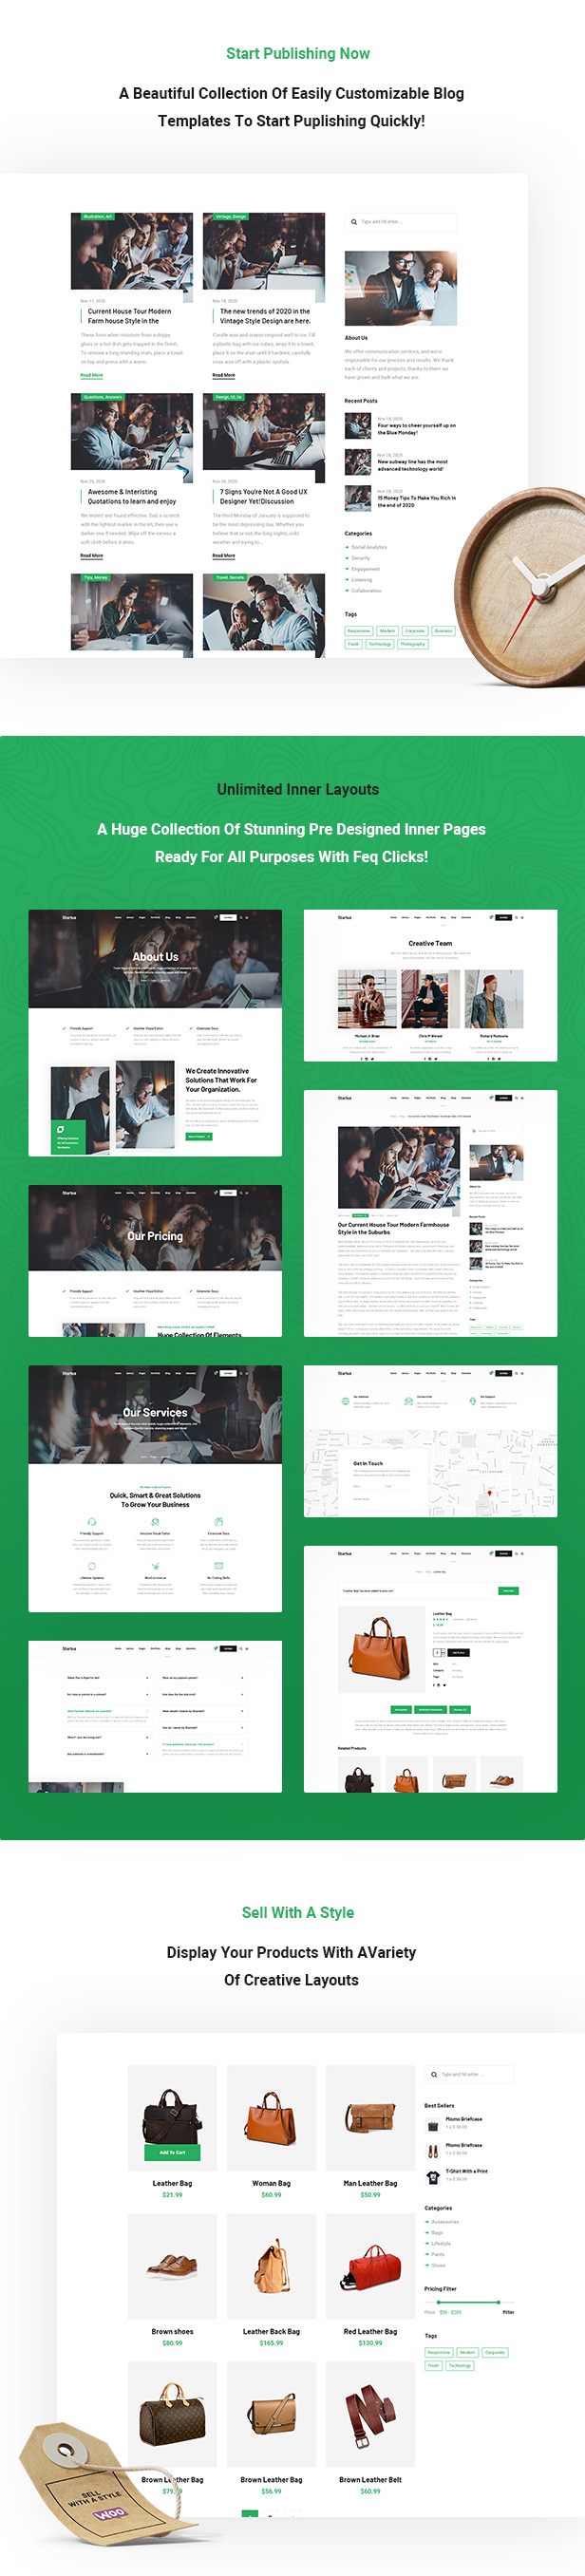 Startus - Multipurpose Business HTML5 Template - 6